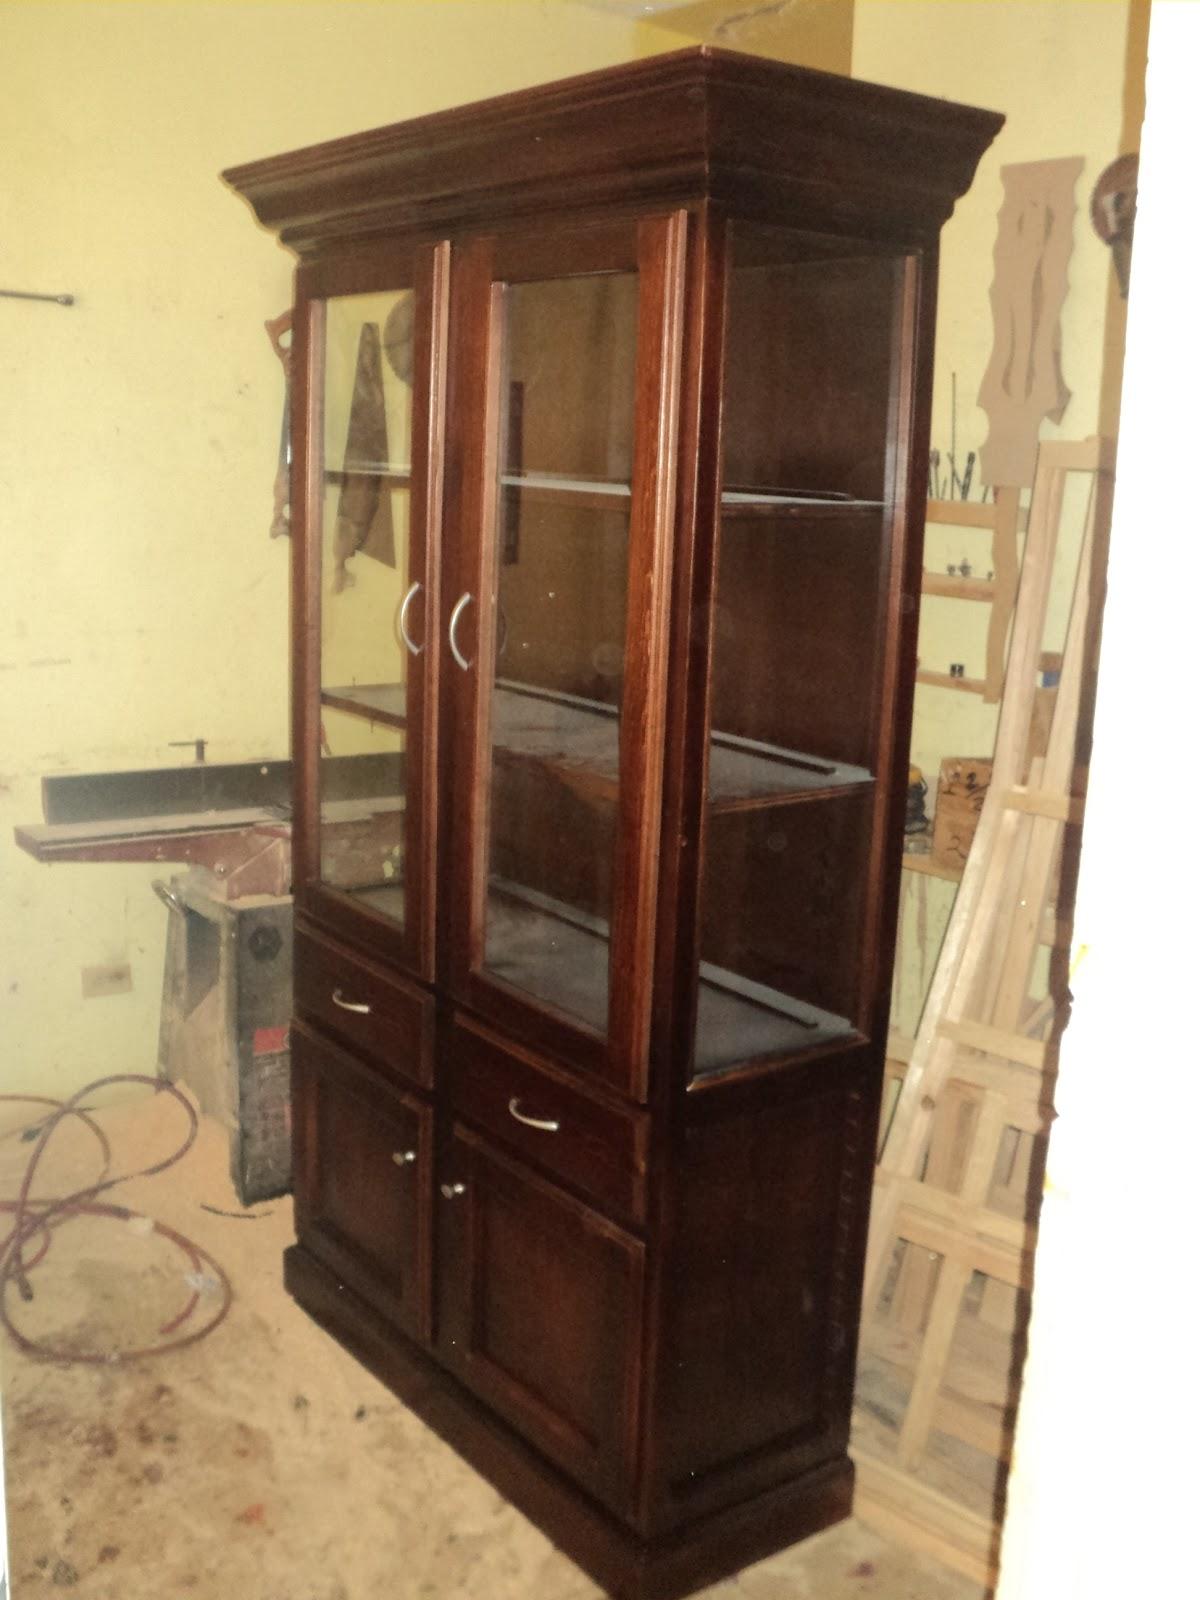 Carpinteria y muebles diaz vitrinas for Muebles diaz